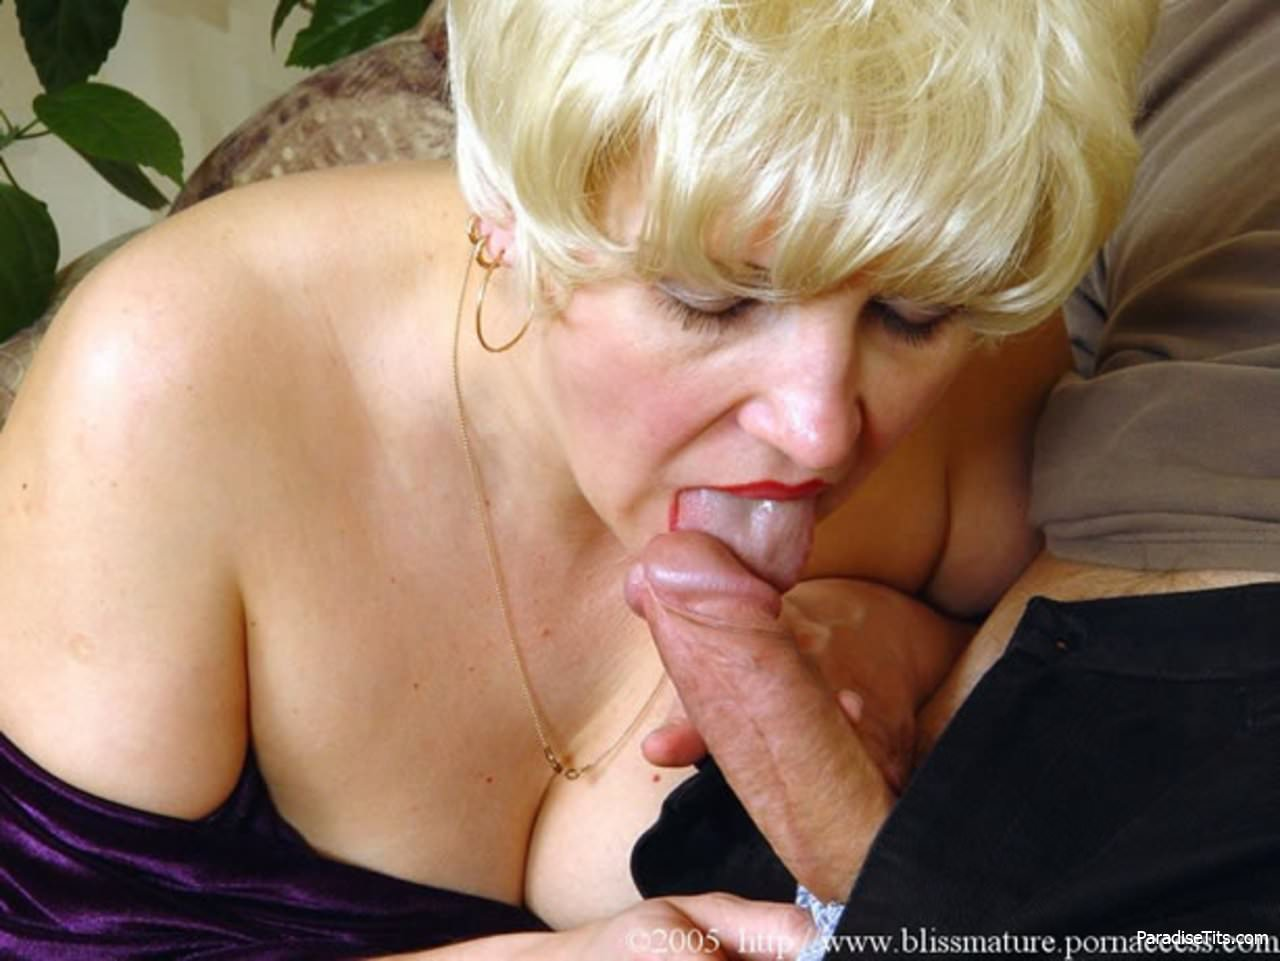 порно фото тетя в возрасте обожает молодой член - 3